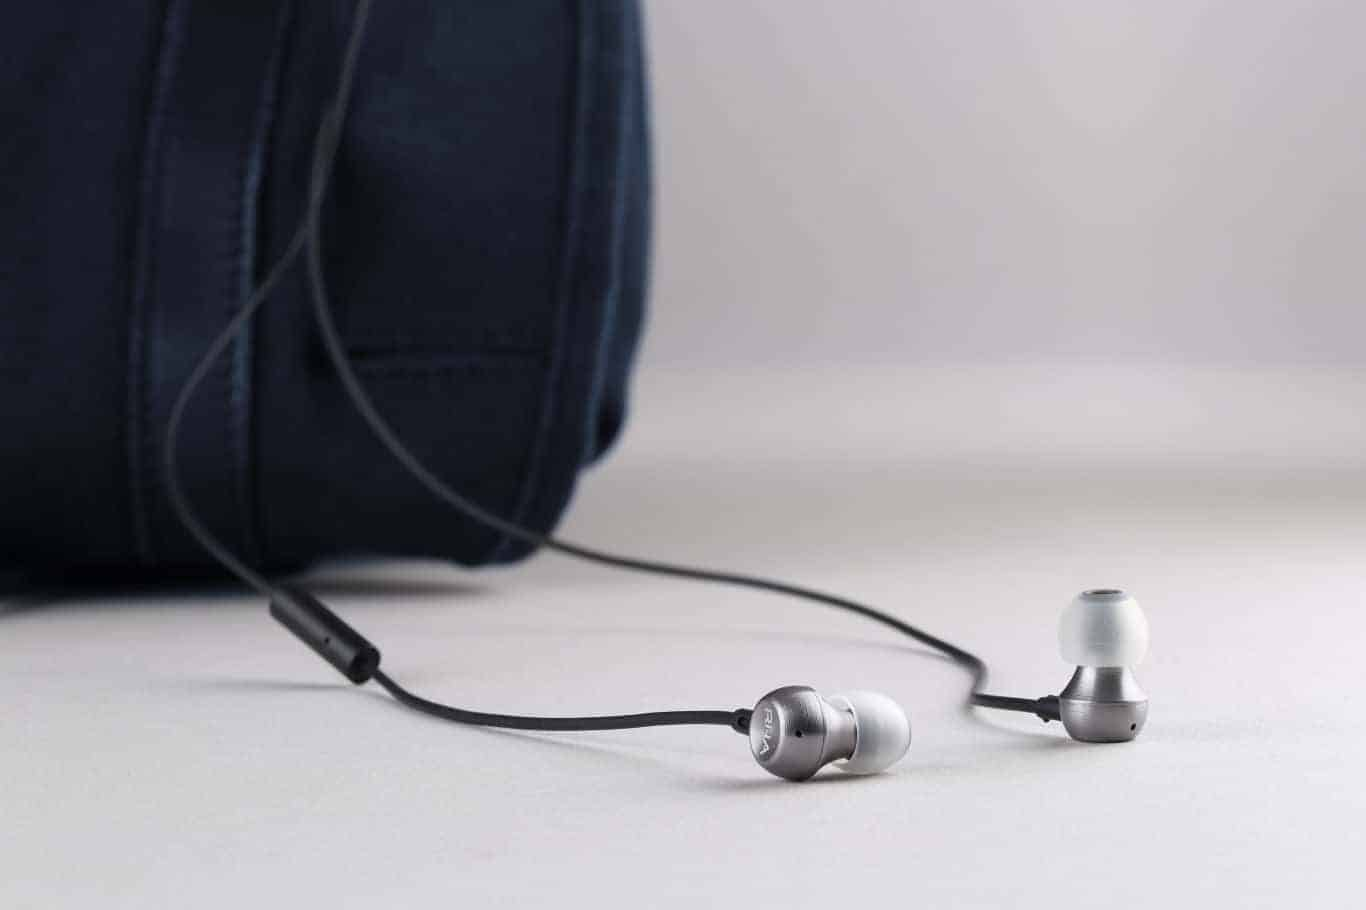 RHA MA390 Headphones 1